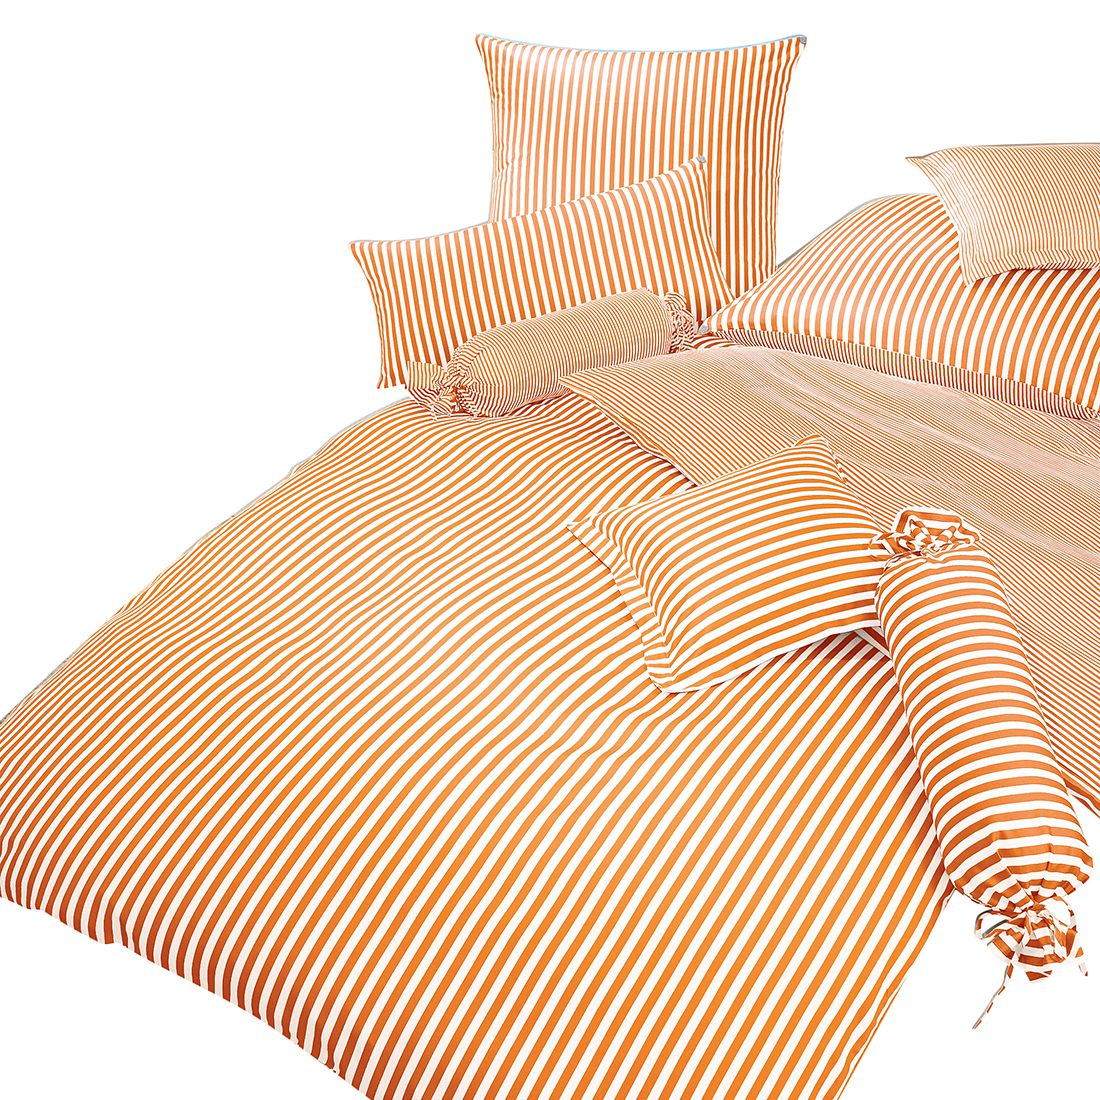 Beddengoed Classic I - Oranje/wit - 155x220cm + kussen 80x80cm, Janine